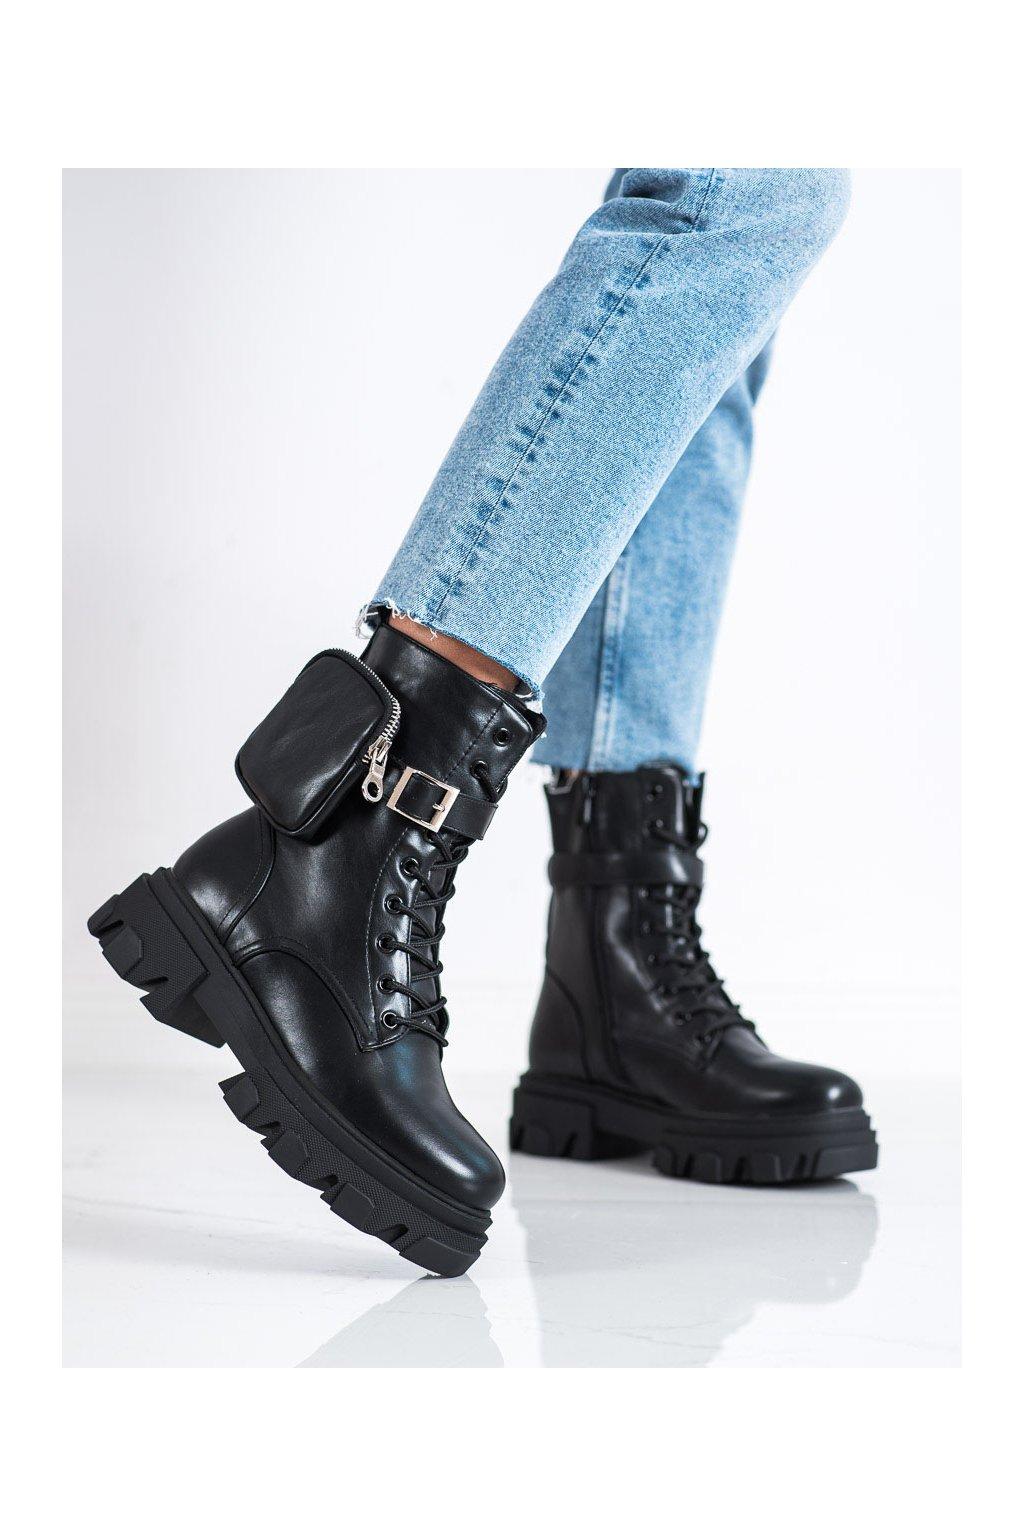 Čierne dámske topánky Bestelle kod 168-291B